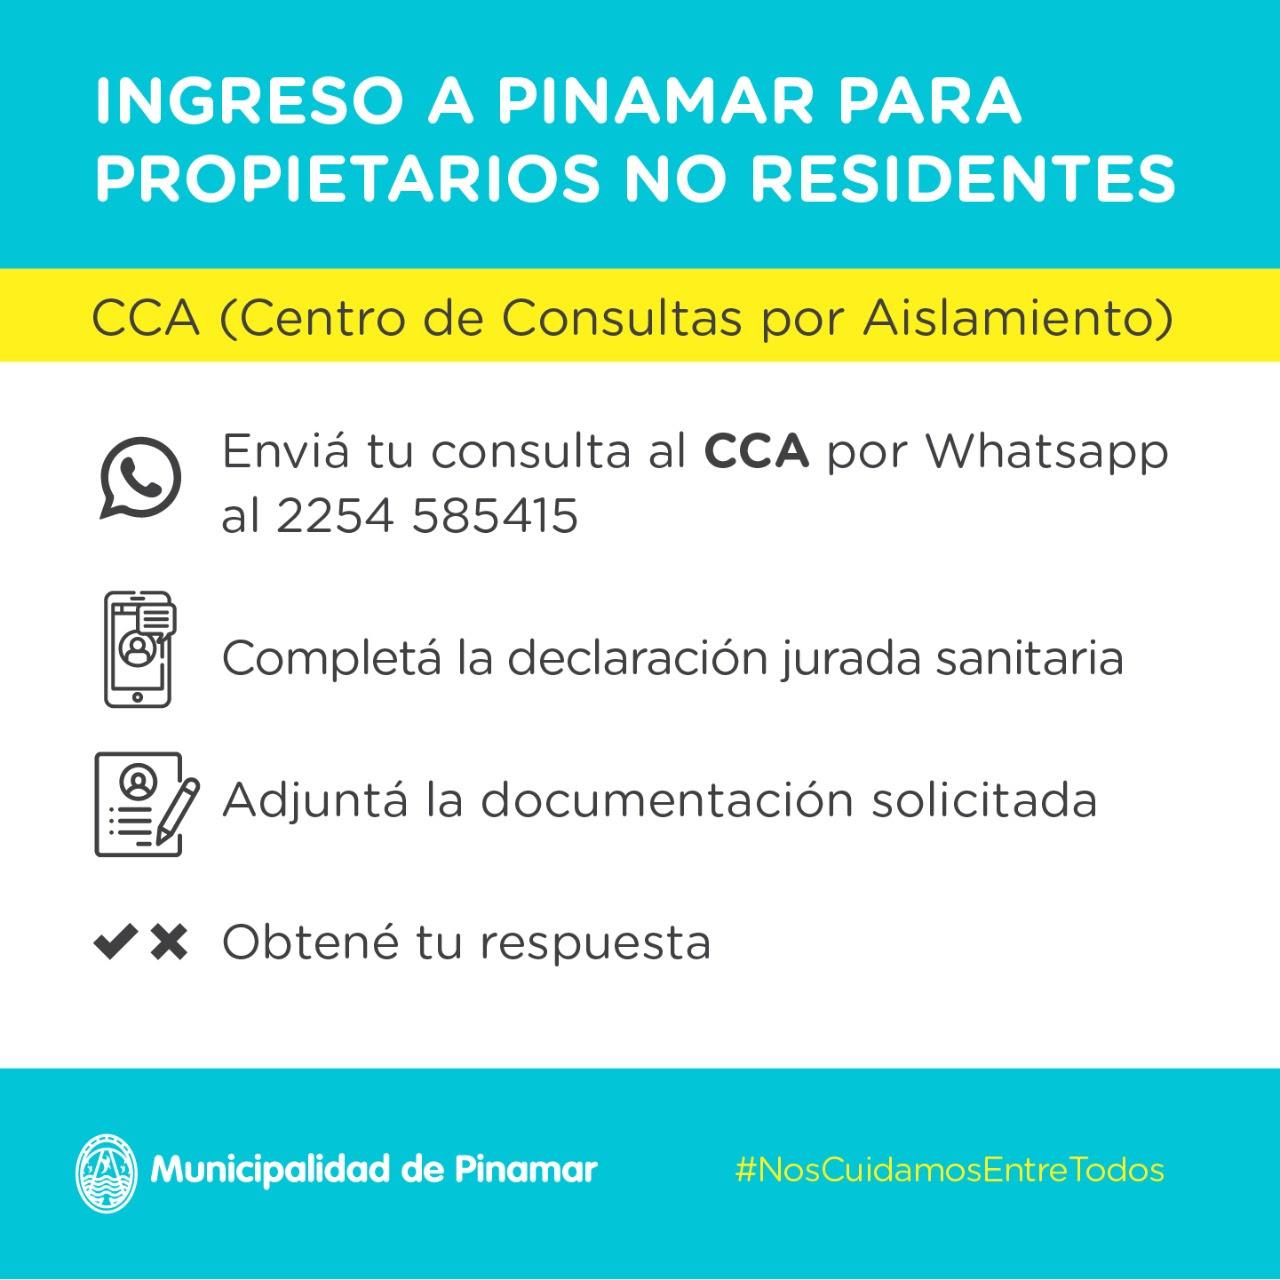 Ingreso a Pinamar para propietarios no residente